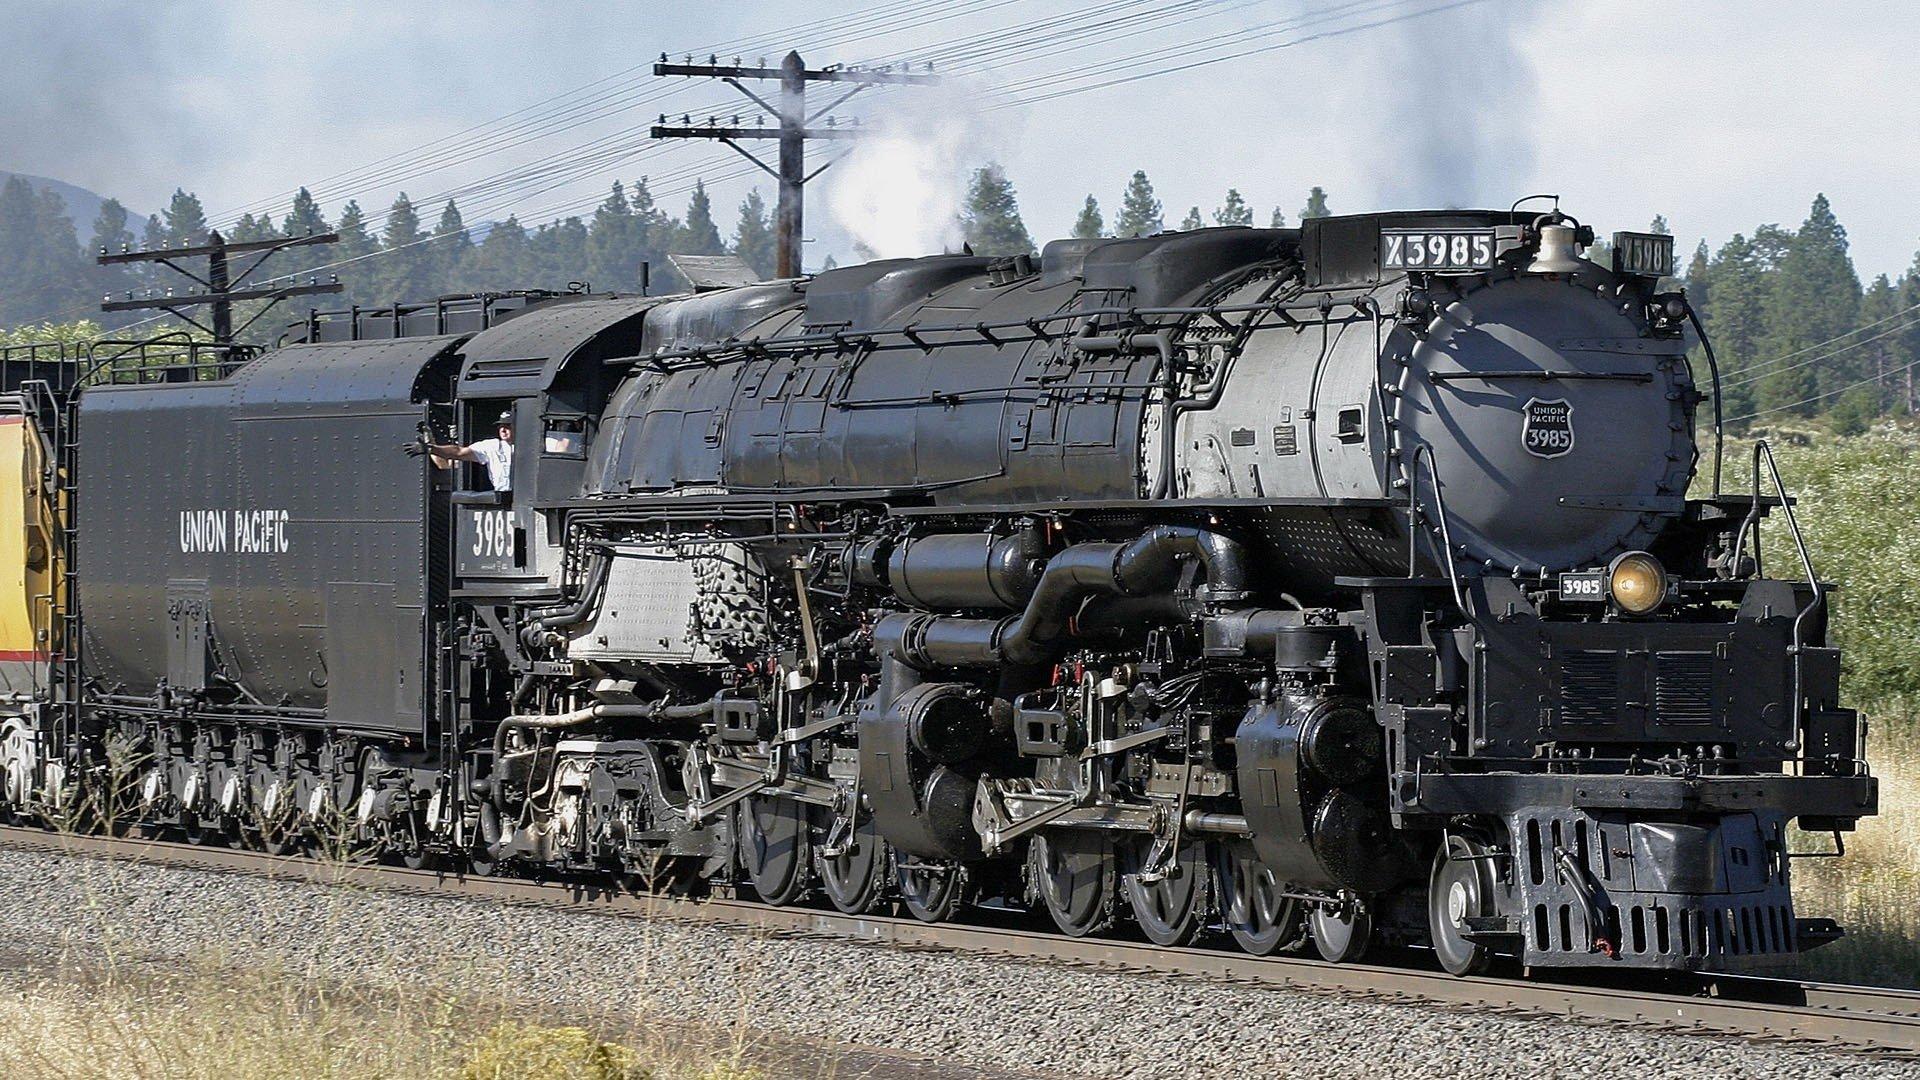 Vehicles - Train  Wallpaper